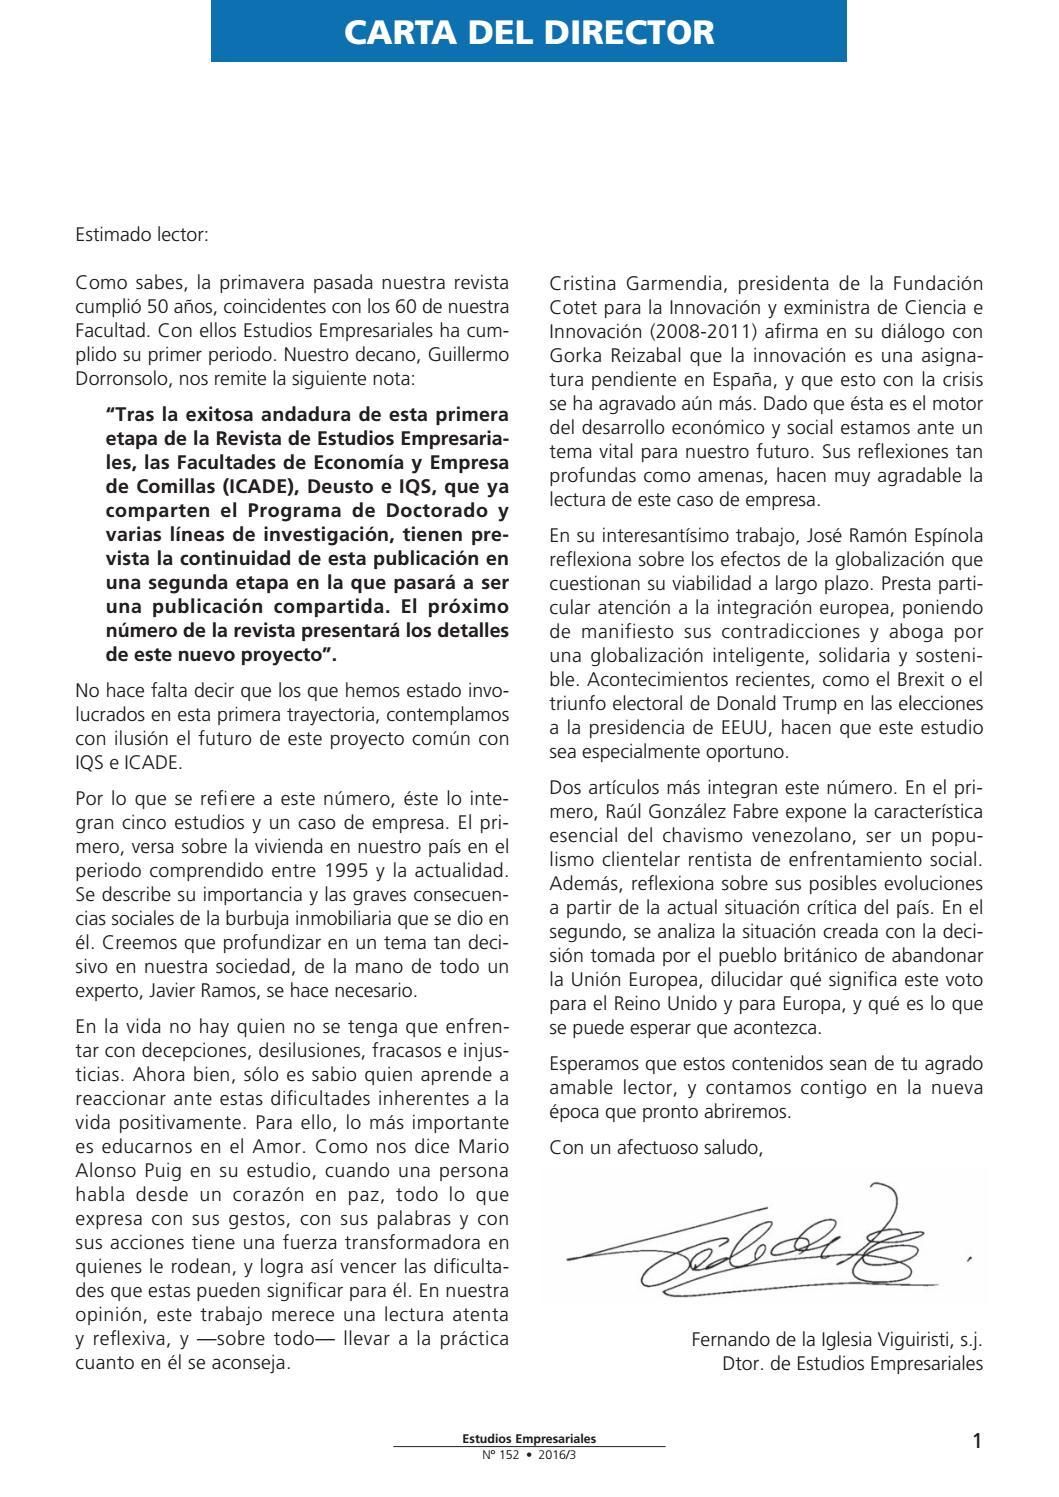 Revista 152 indbtx by Michelena artes gráficas - issuu